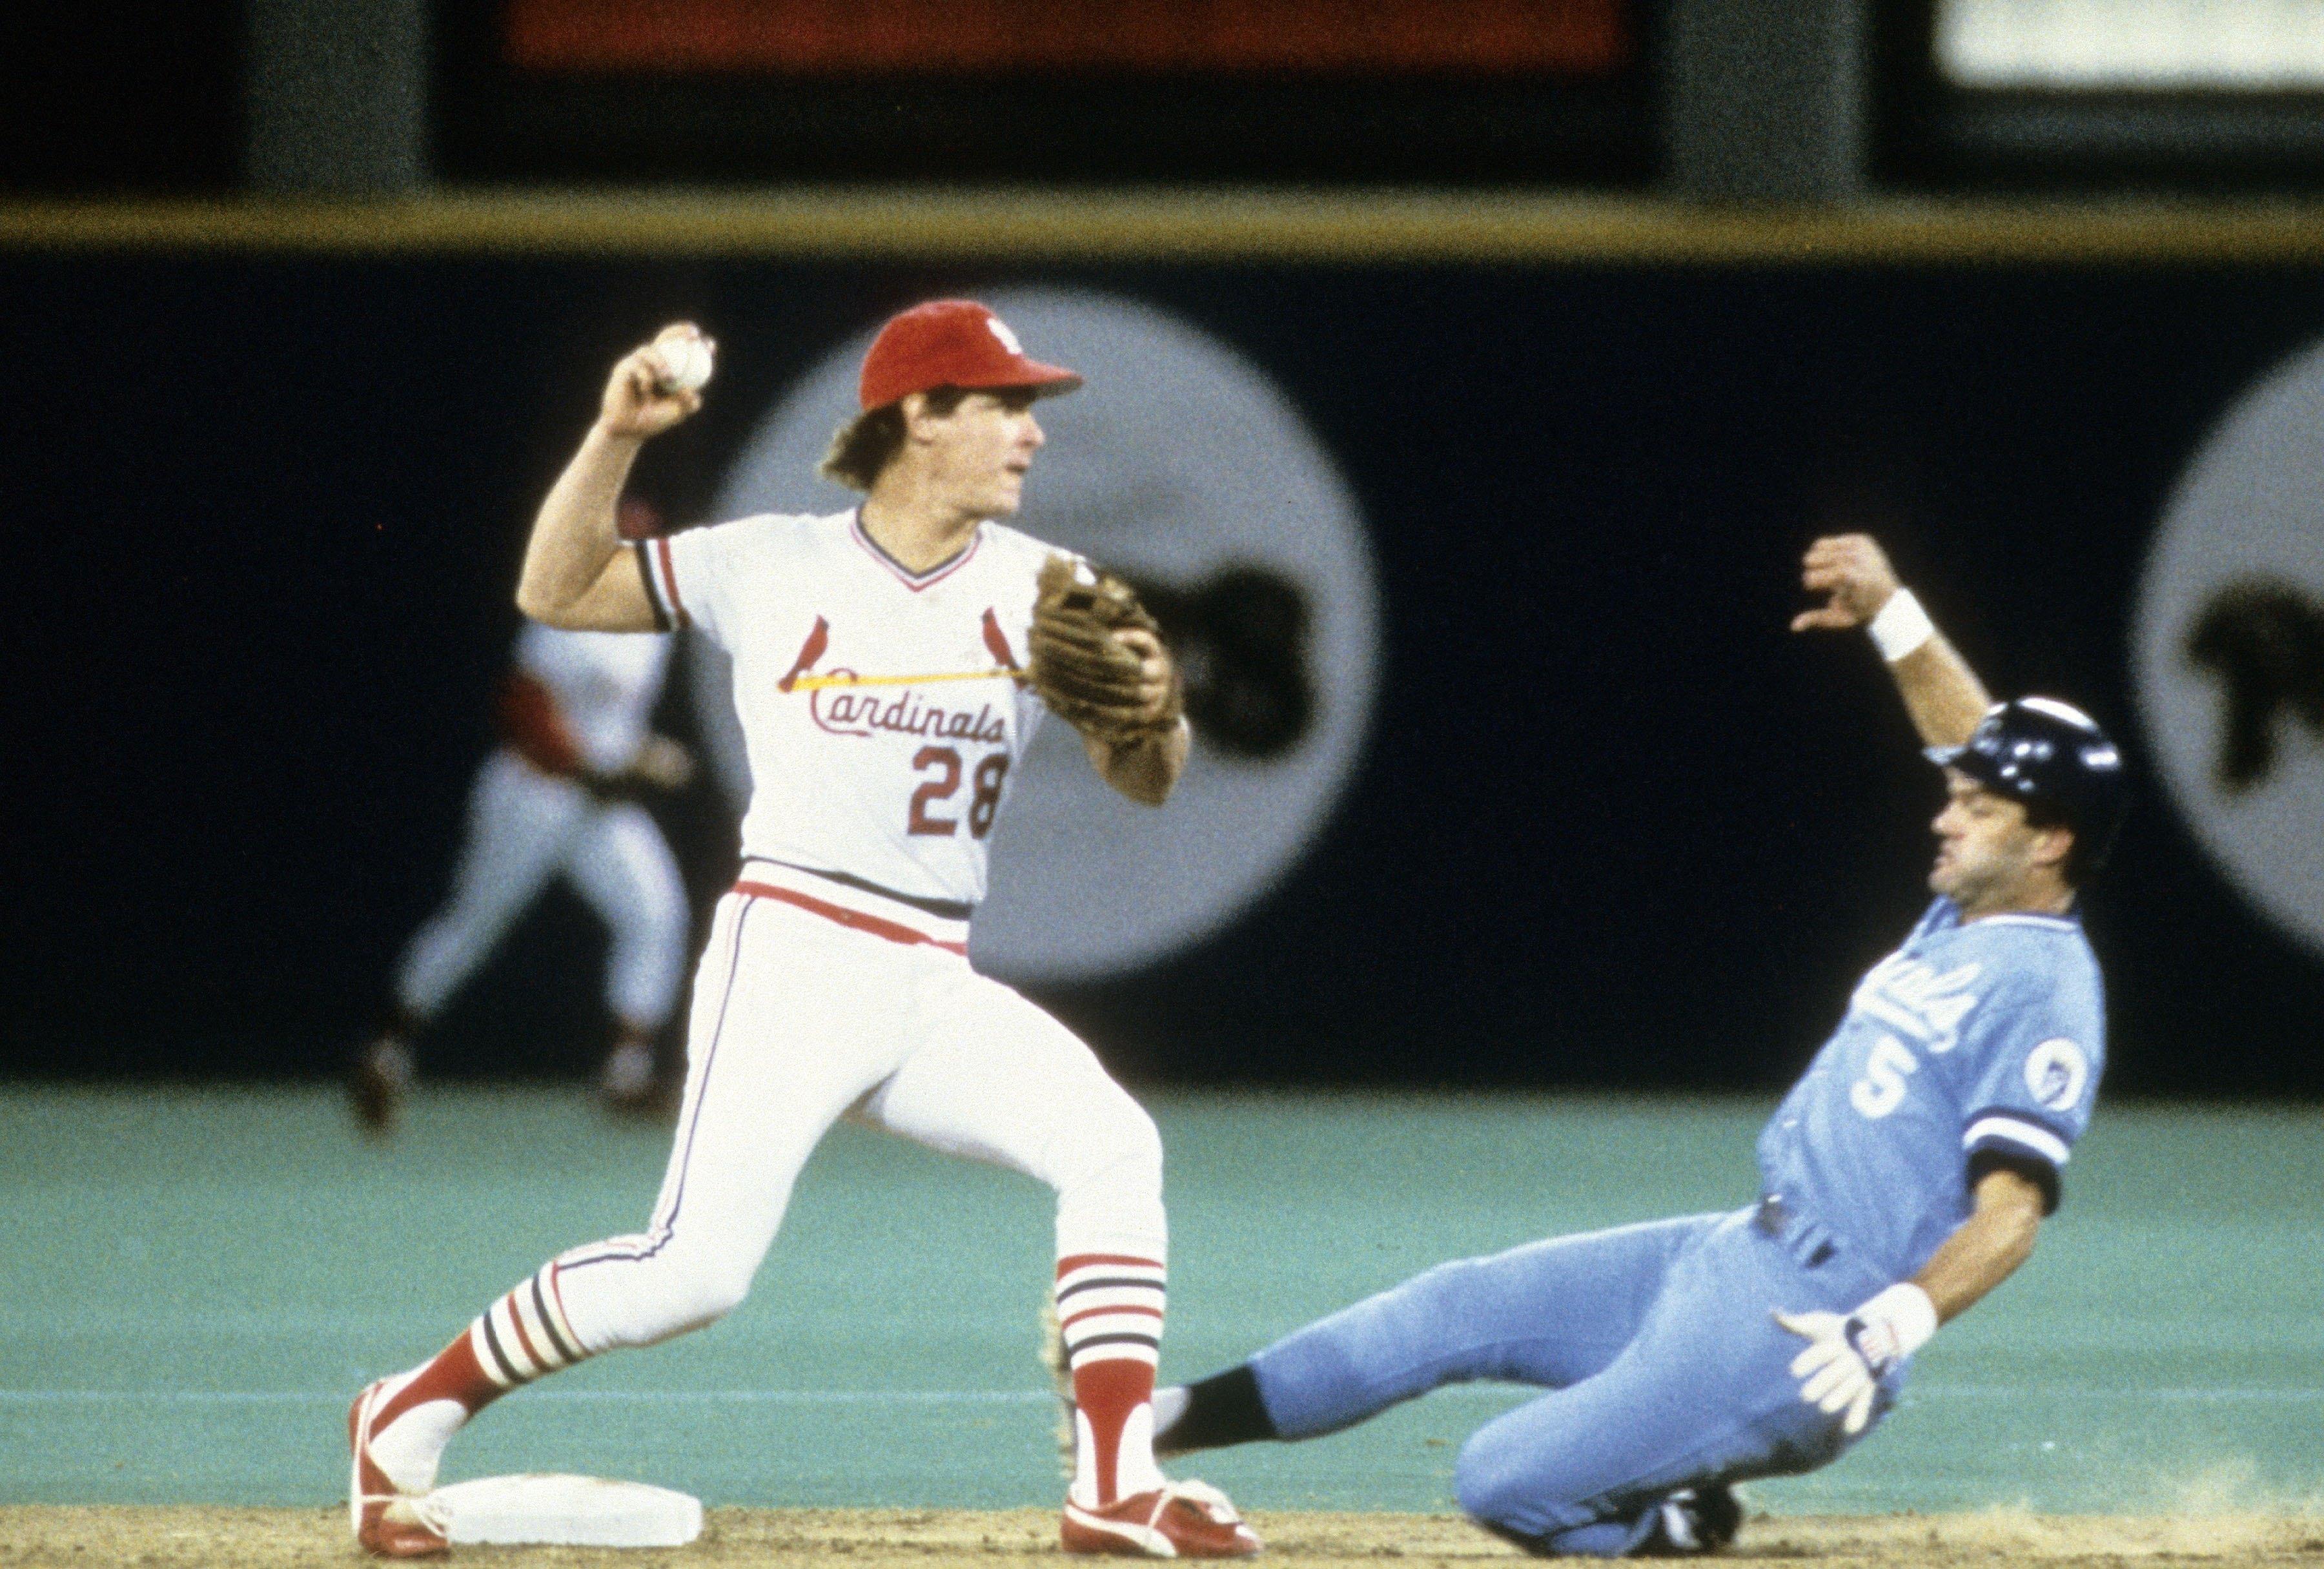 World Series: Kansas City Royal v St. Louis Cardinals, October, 1985